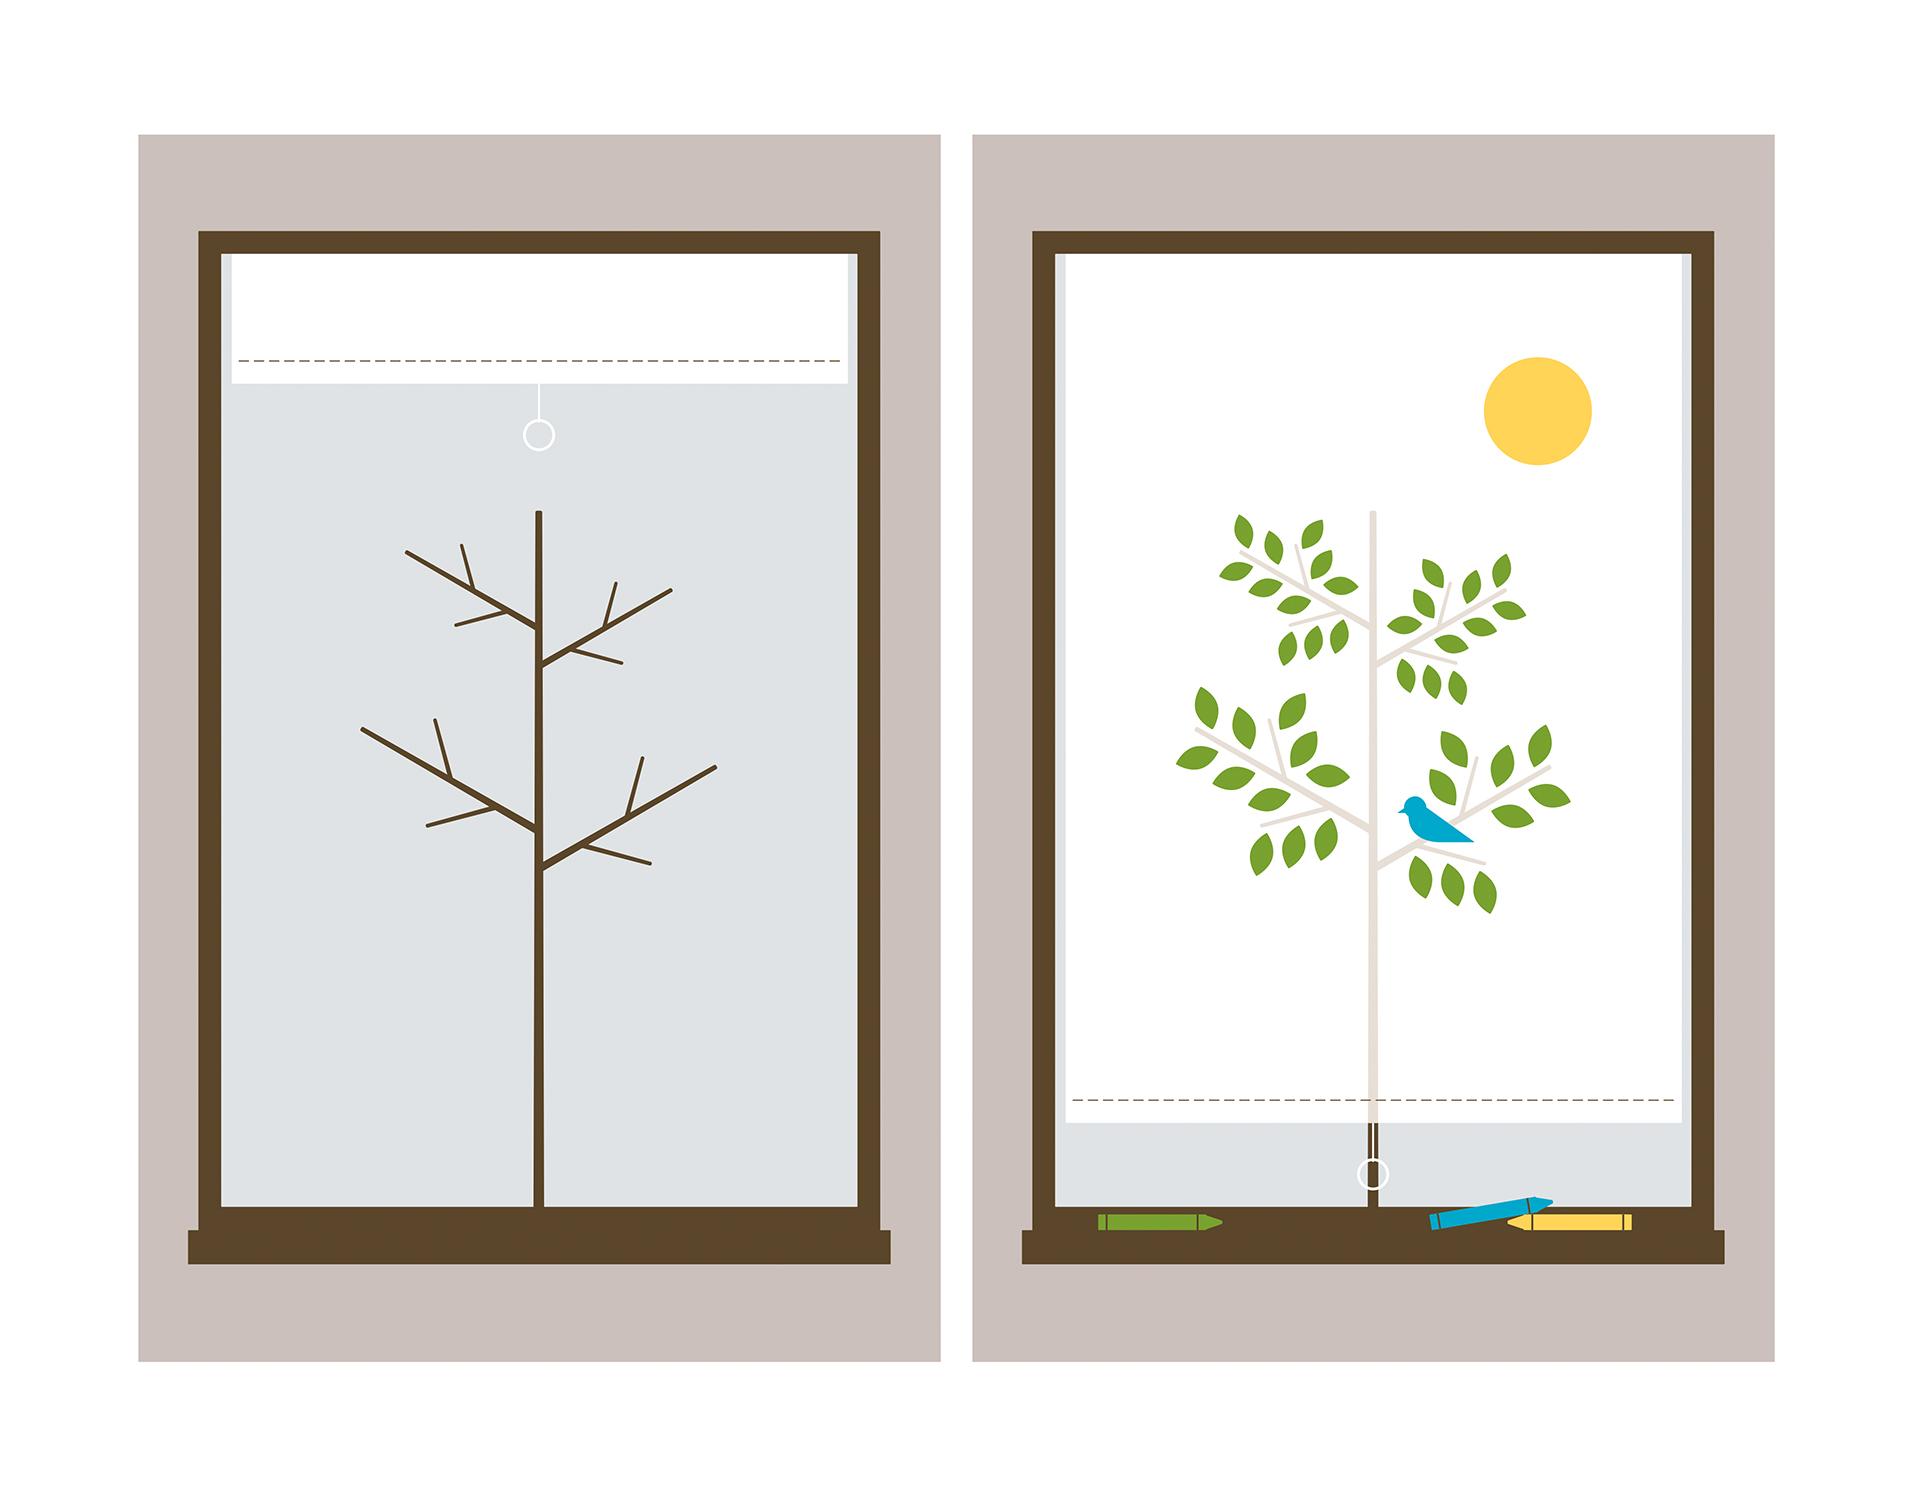 'Spring' By Jason Munn